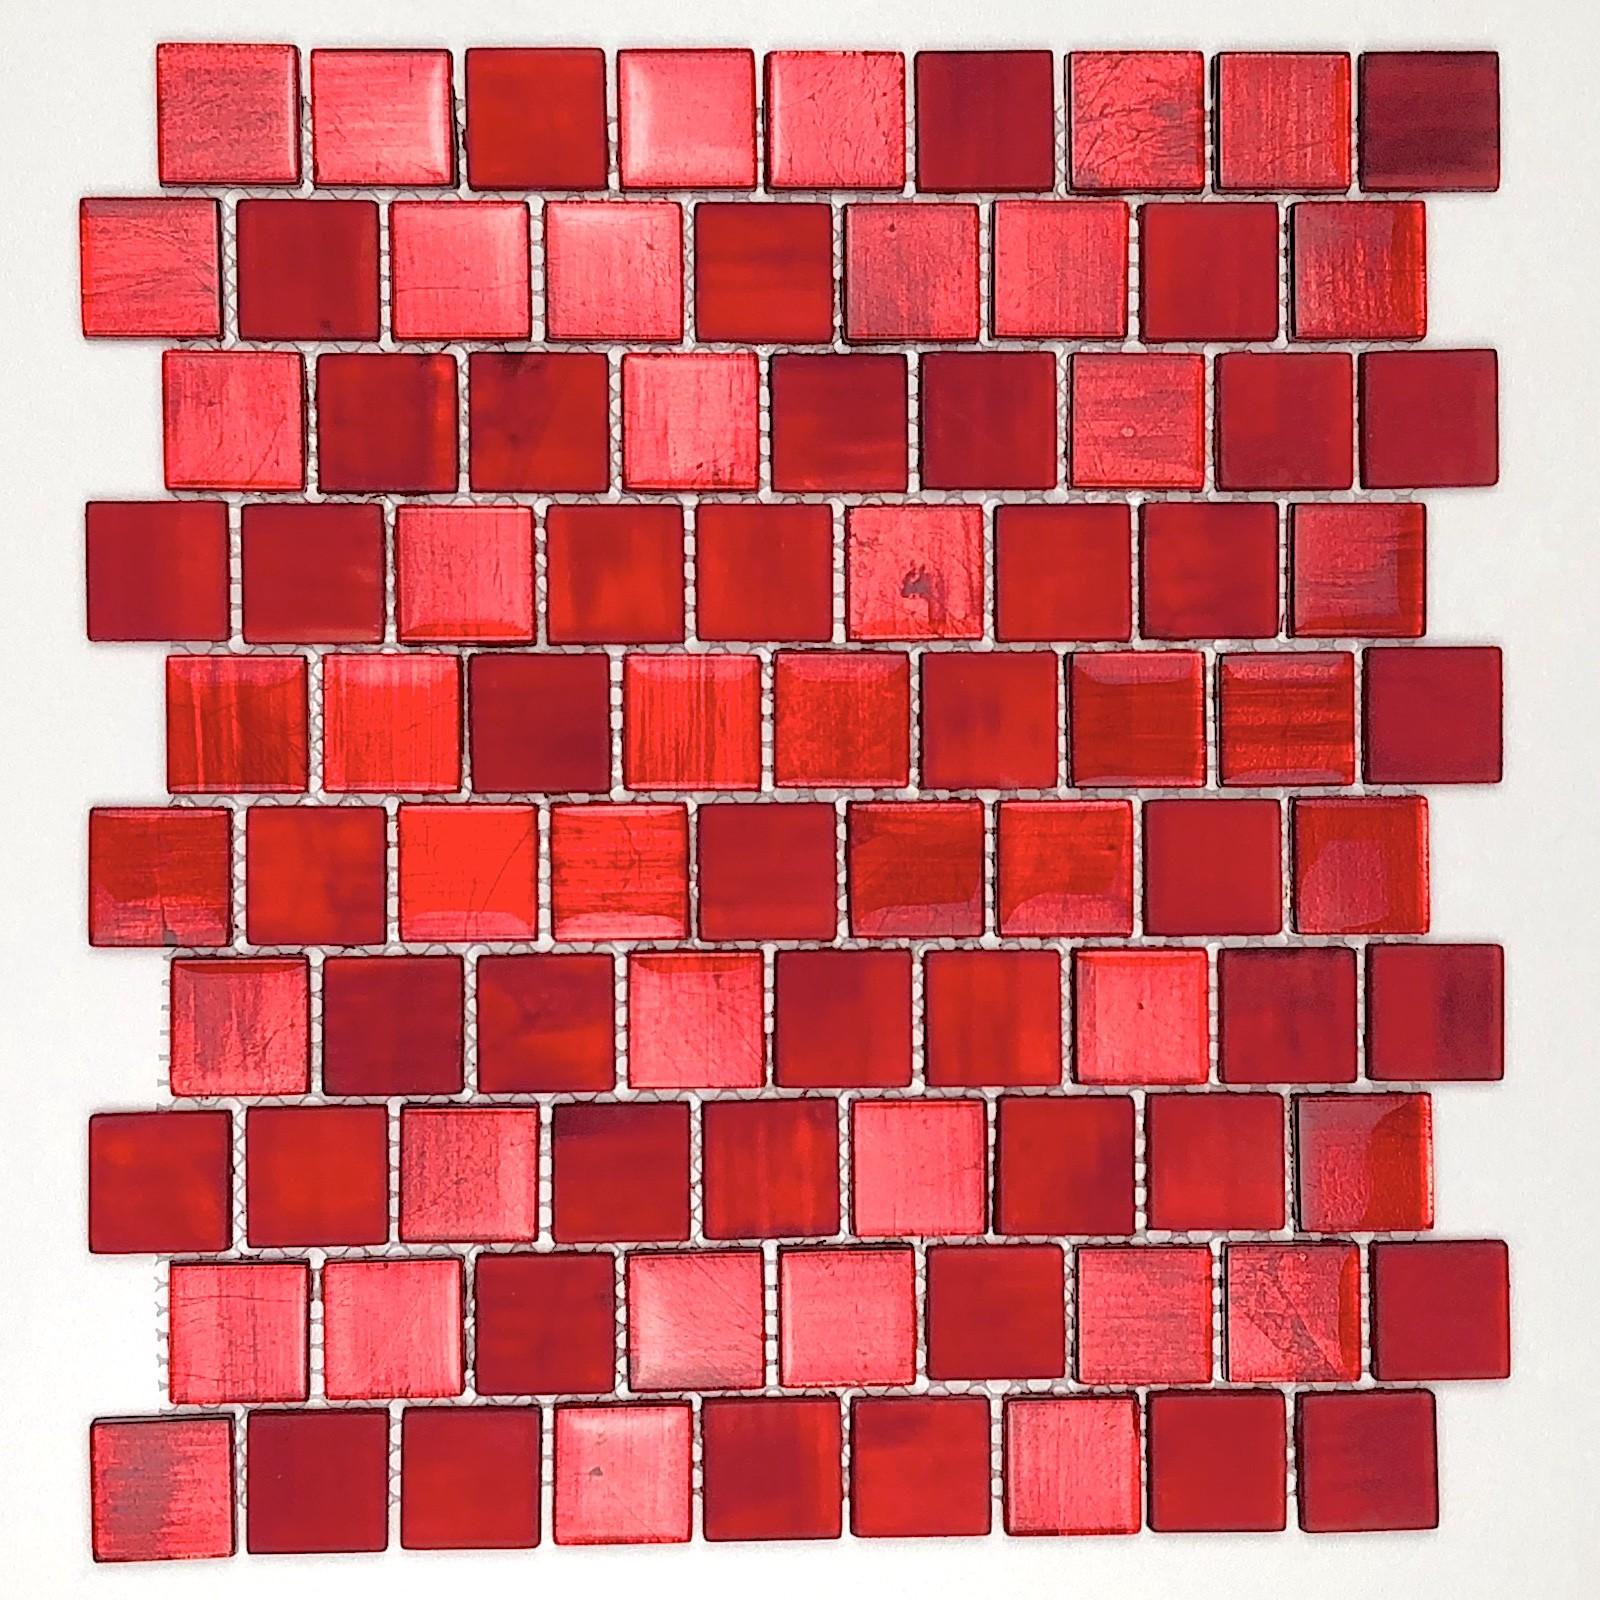 Carrelage Mur Cuisine Et Credence Salle De Bain Modele Mv Drio Rouge Carrelage Inox Fr